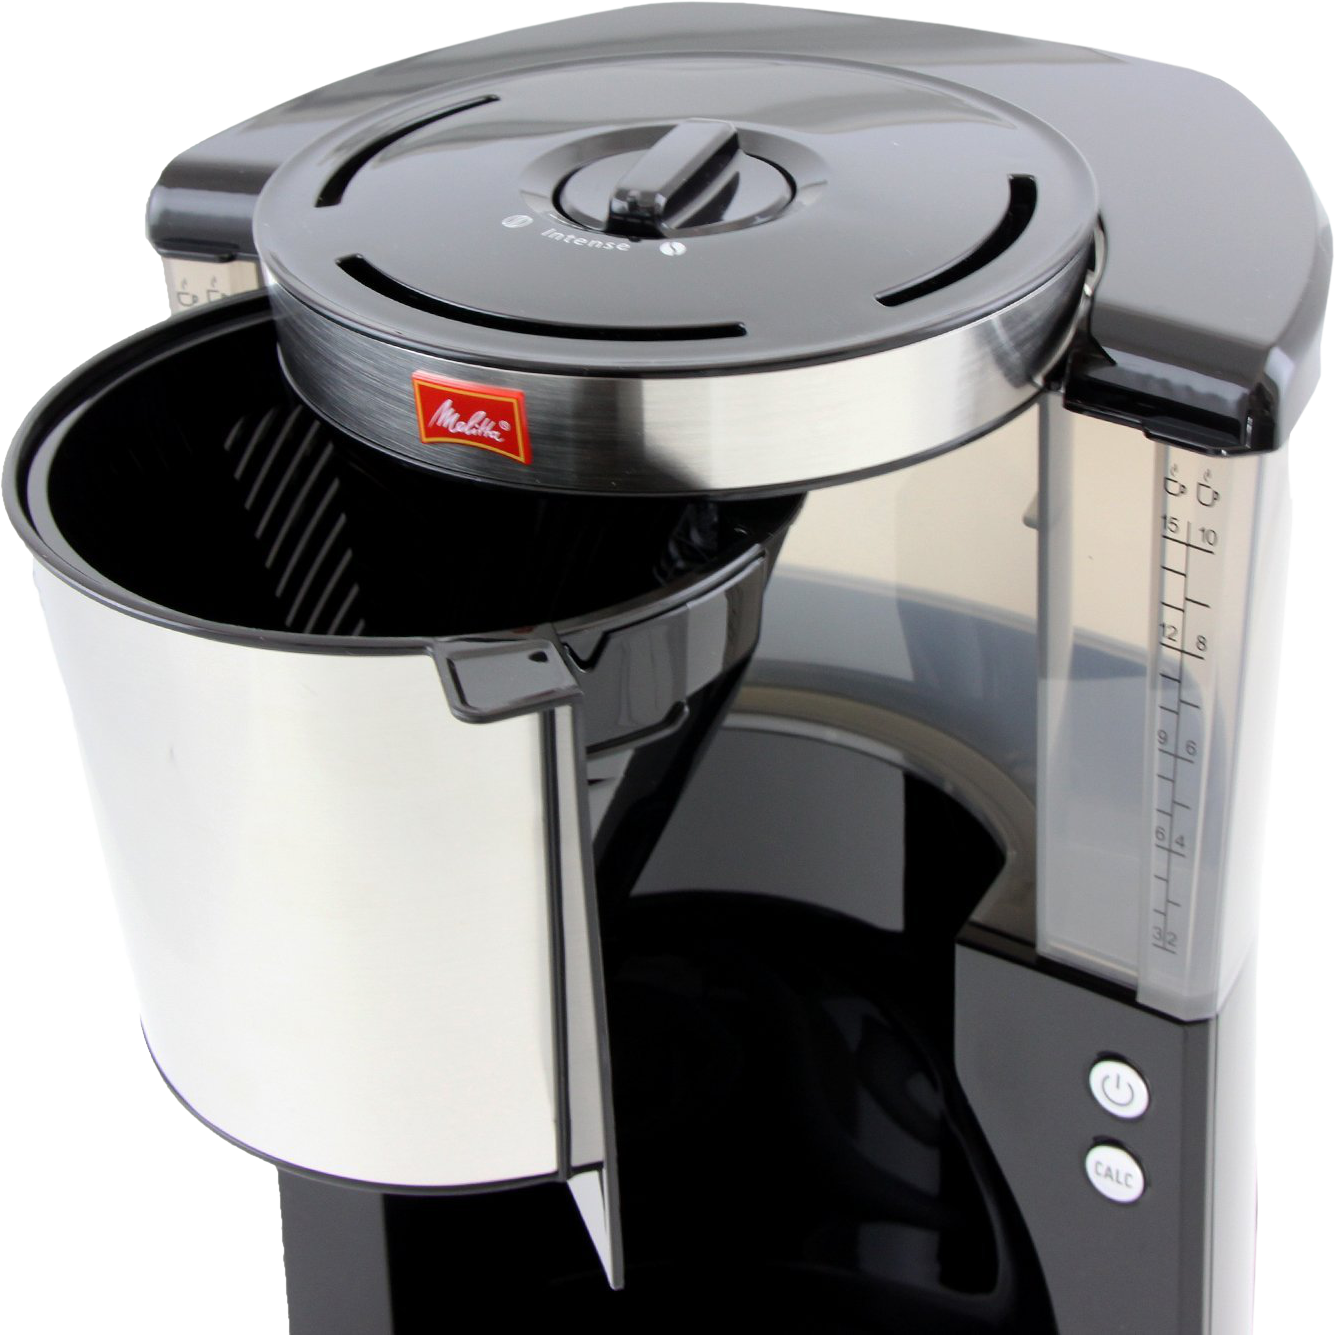 melitta look therm deluxe machine caf filtre l noir inox machines de filtrage. Black Bedroom Furniture Sets. Home Design Ideas